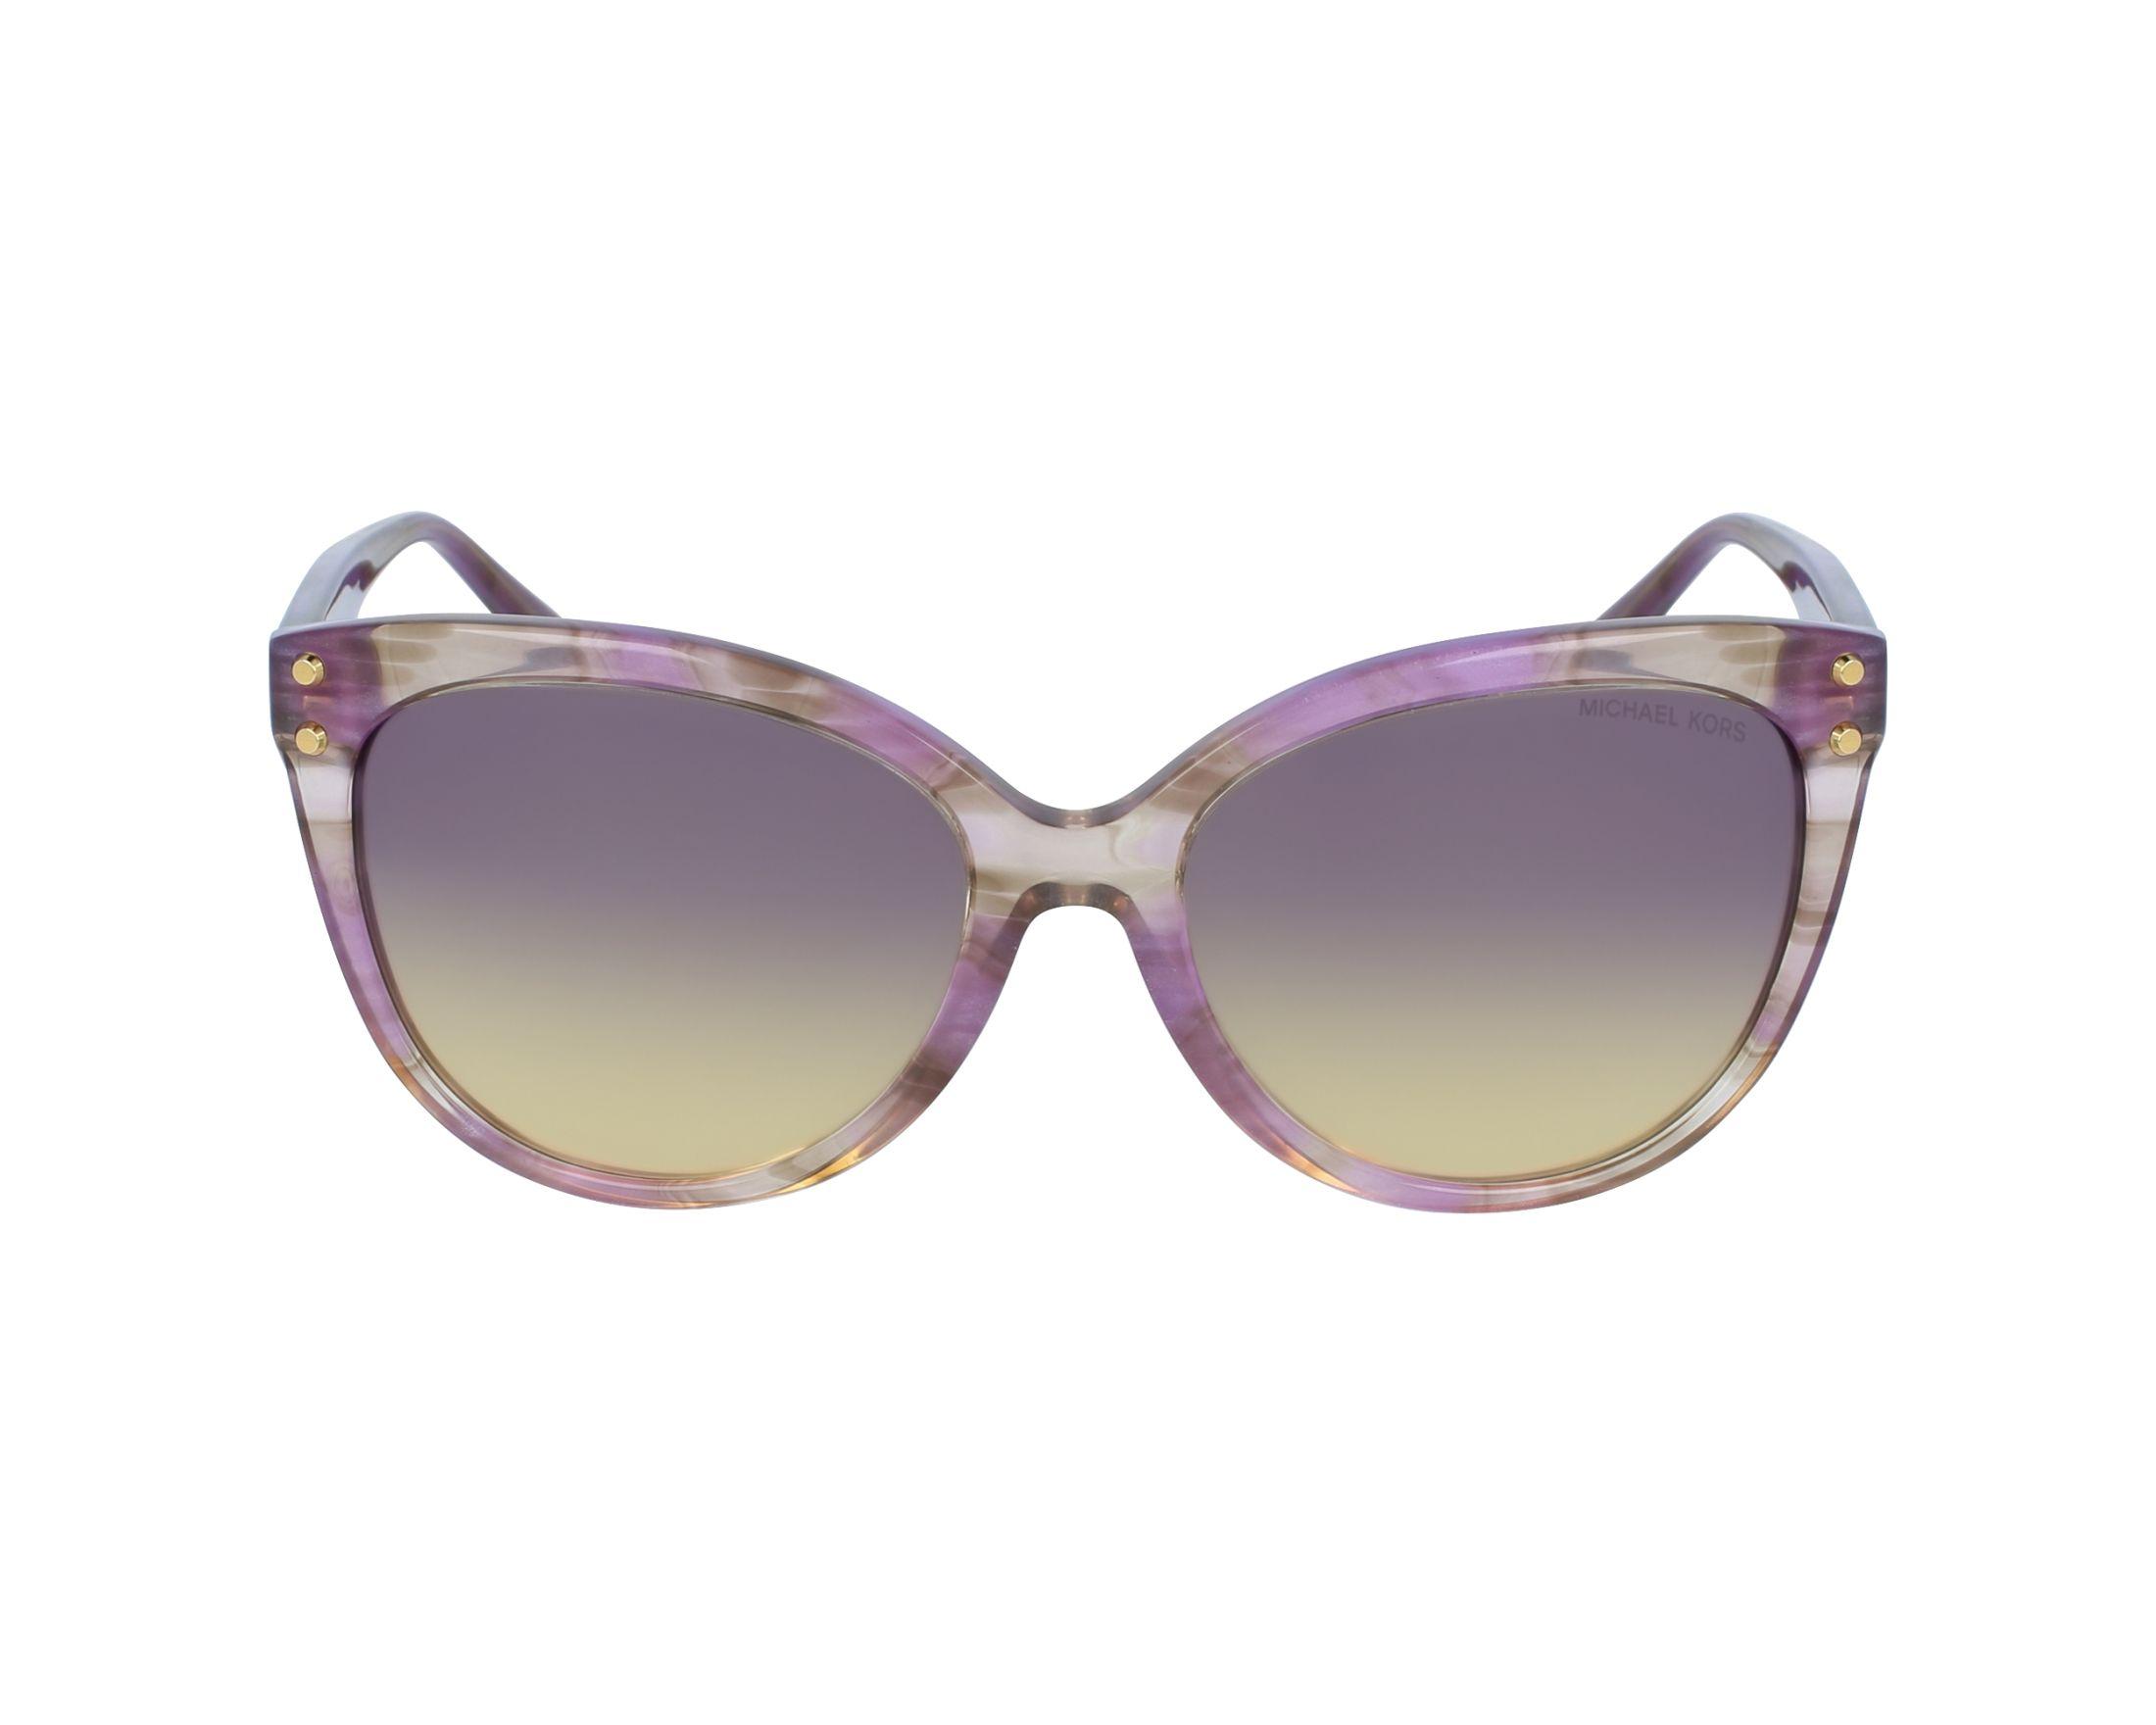 13e45d14c5 Sunglasses Michael Kors MK-2045 323370 55-16 Purple profile view